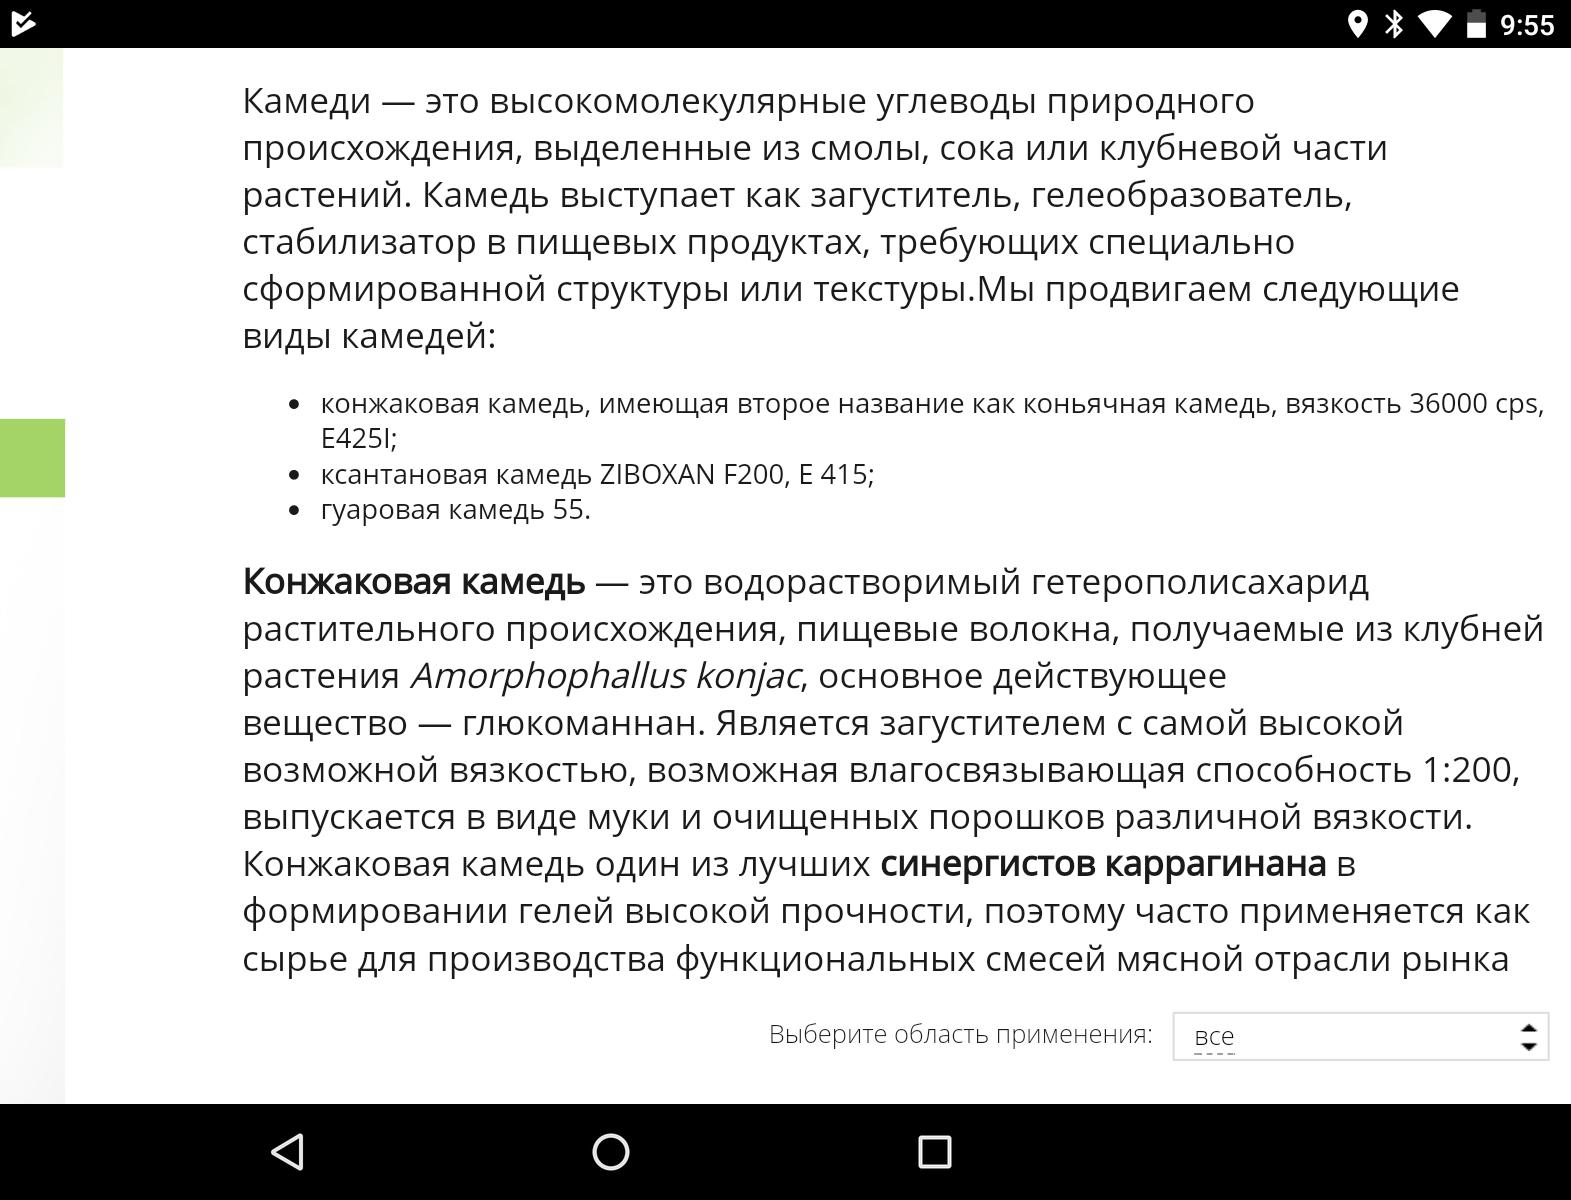 Screenshot_20171230-095518.png